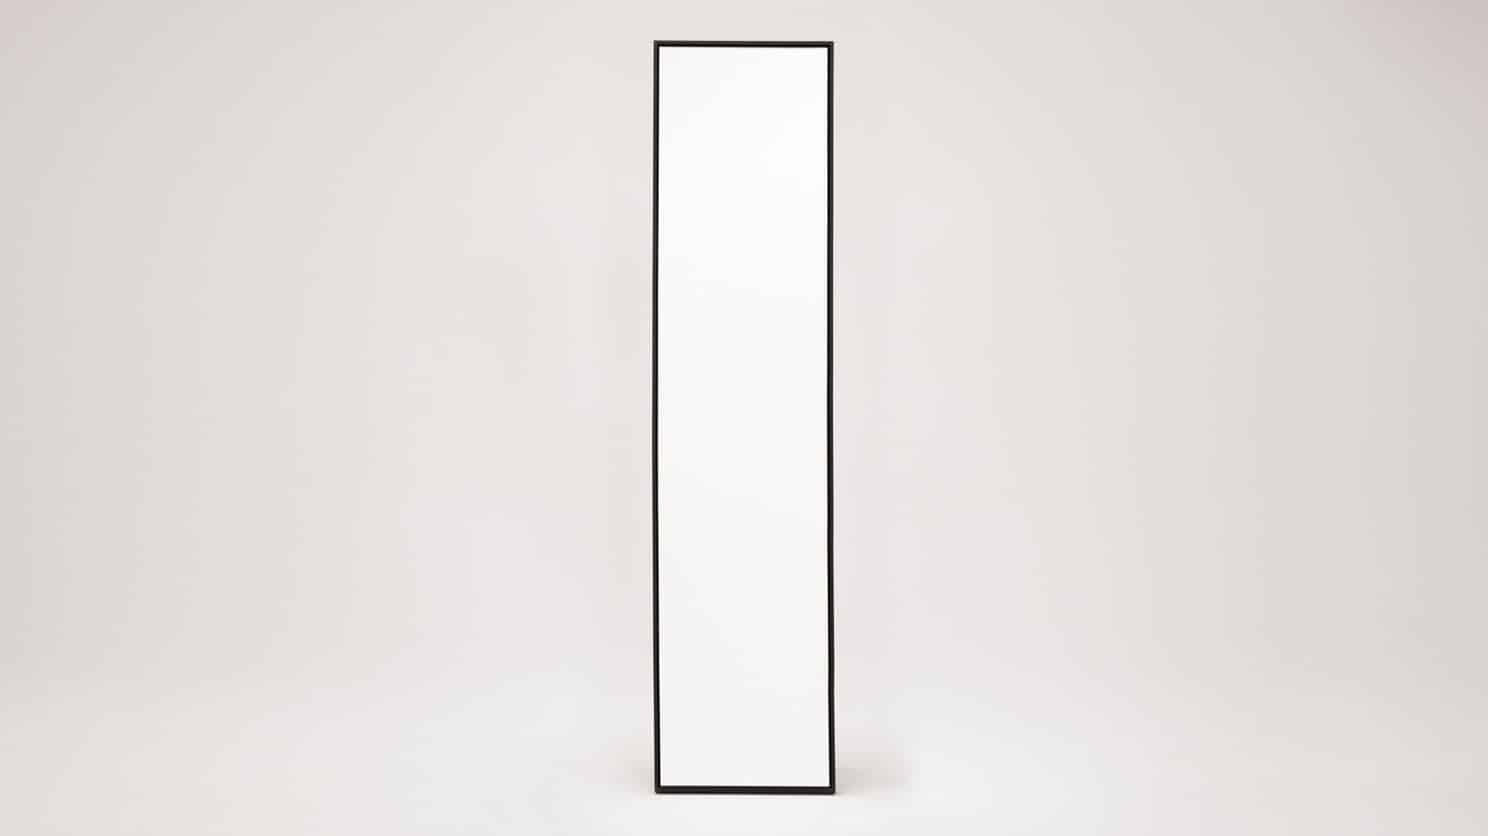 3130 204 6 1 mirror spy floor black front